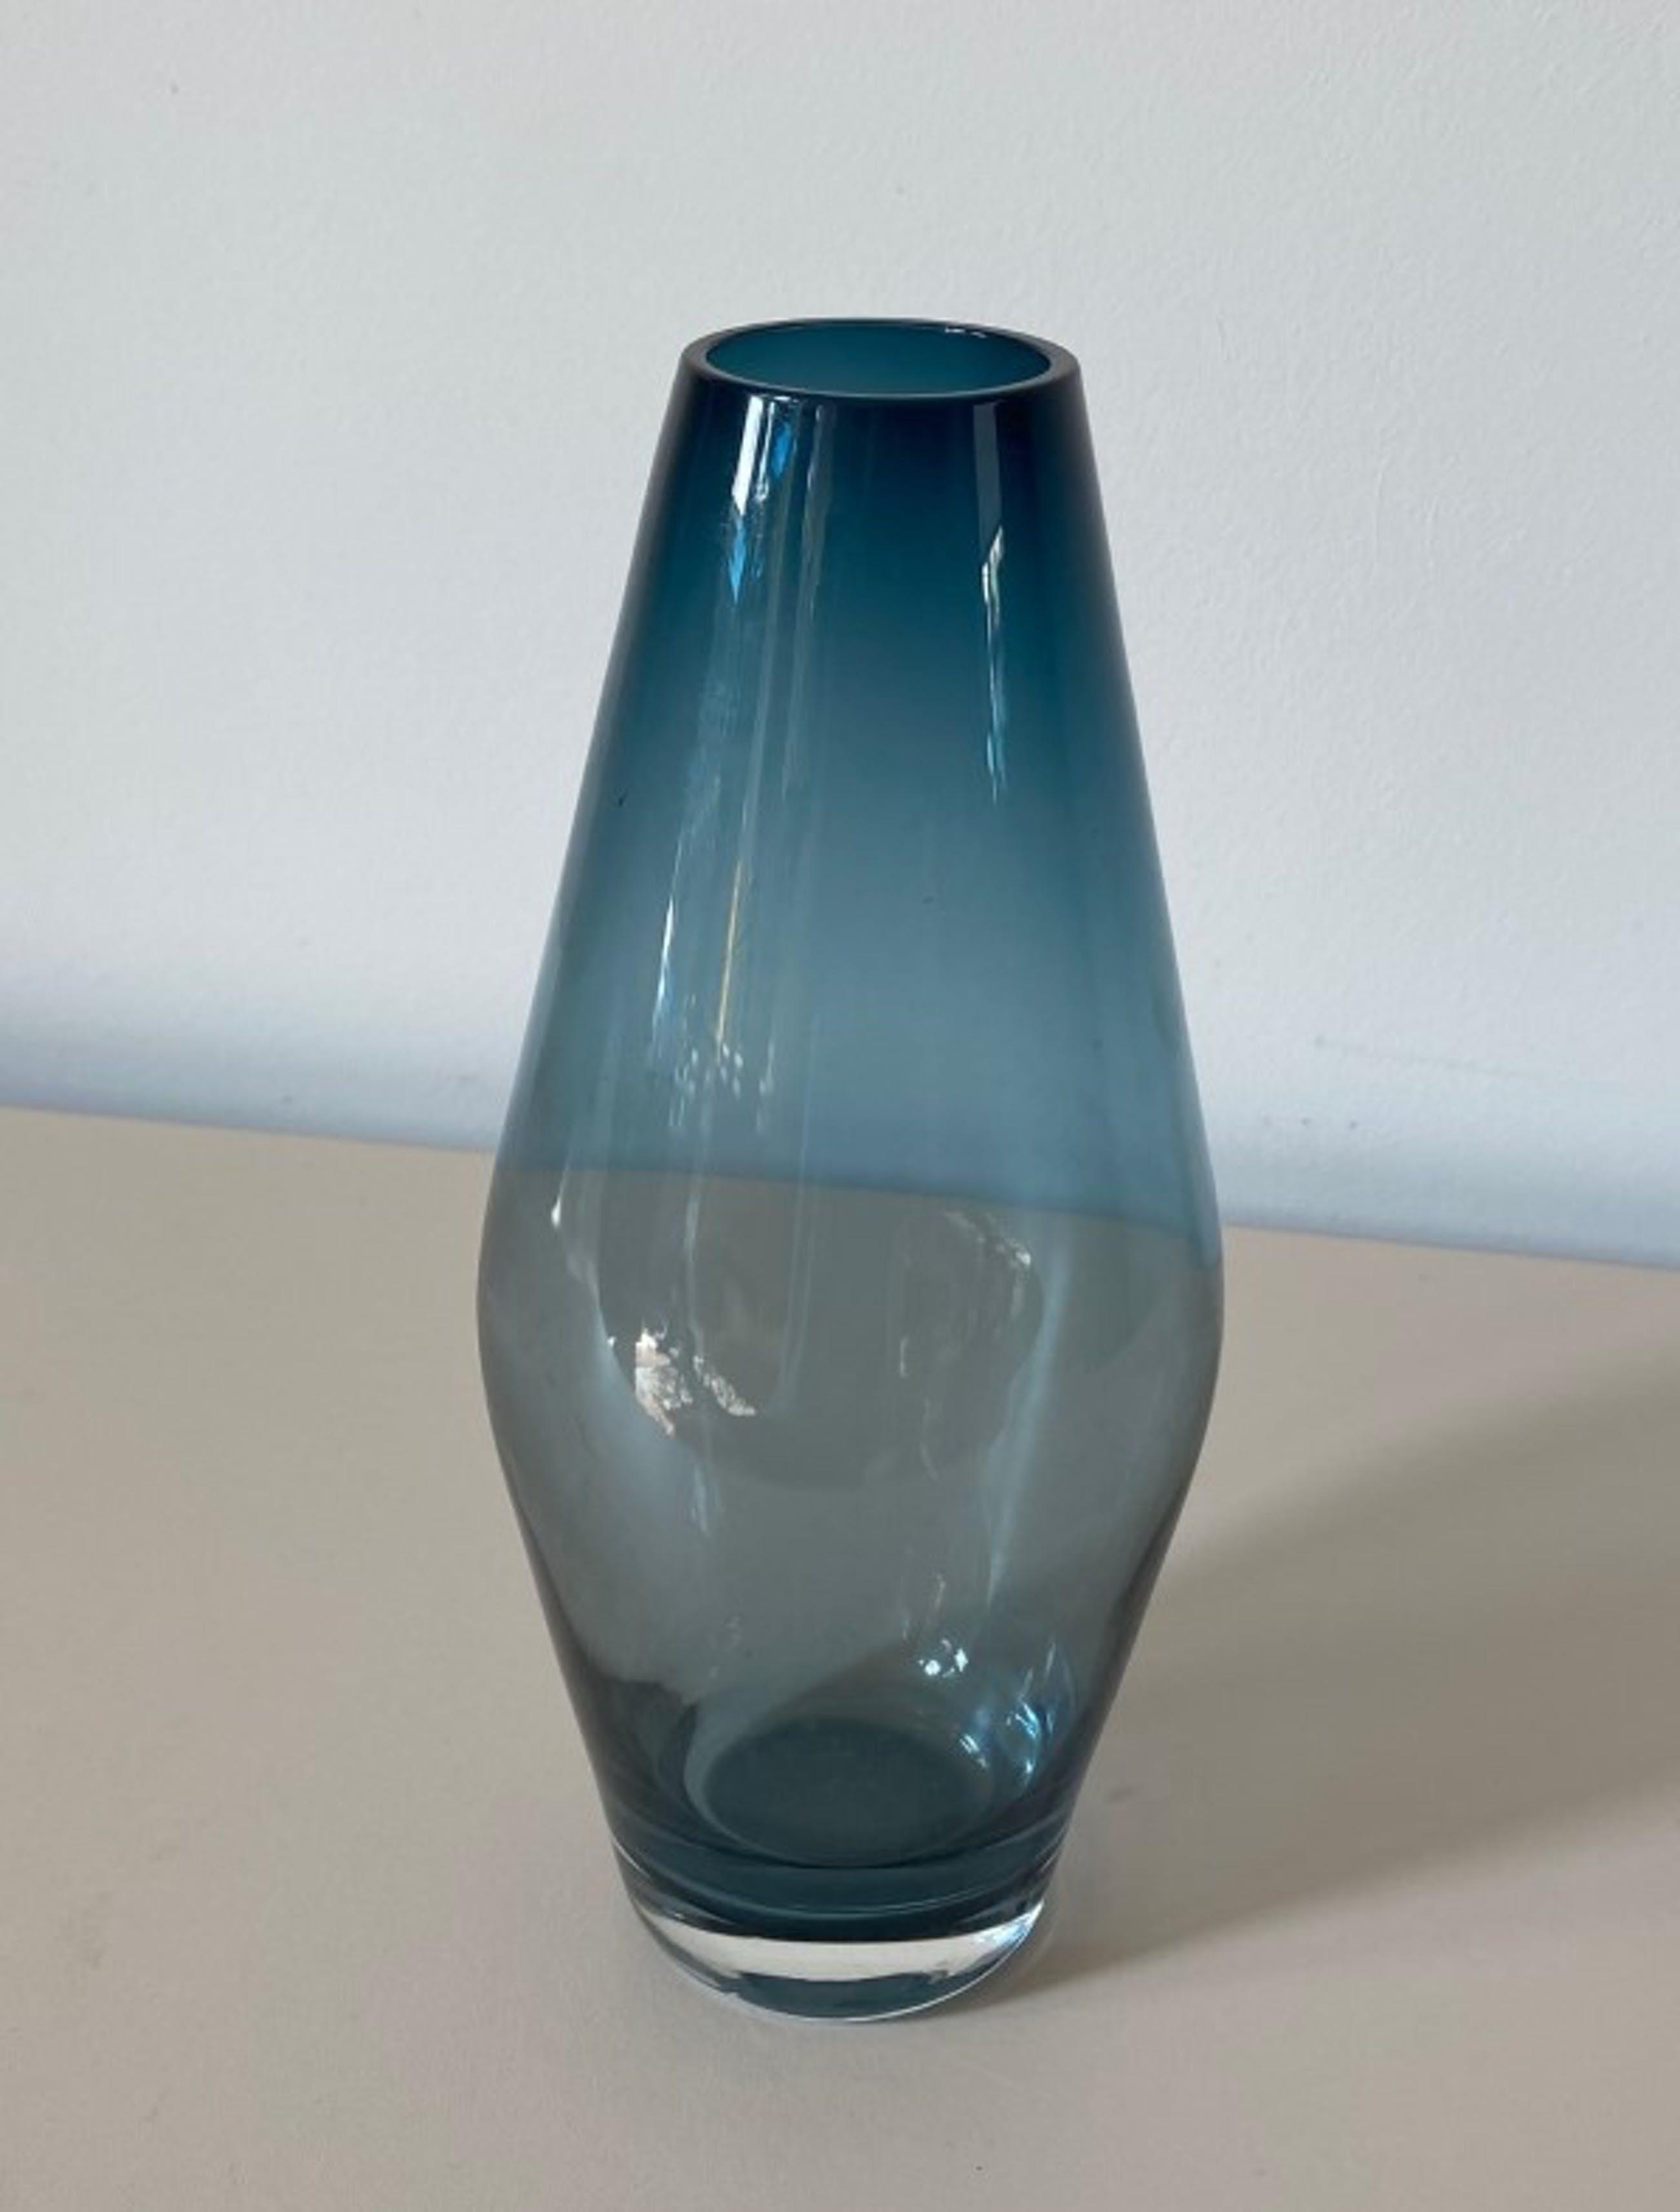 Tamara Aladin - Saffierblauwe glazenvaas - Riihimaki kopen? Bied vanaf 1!